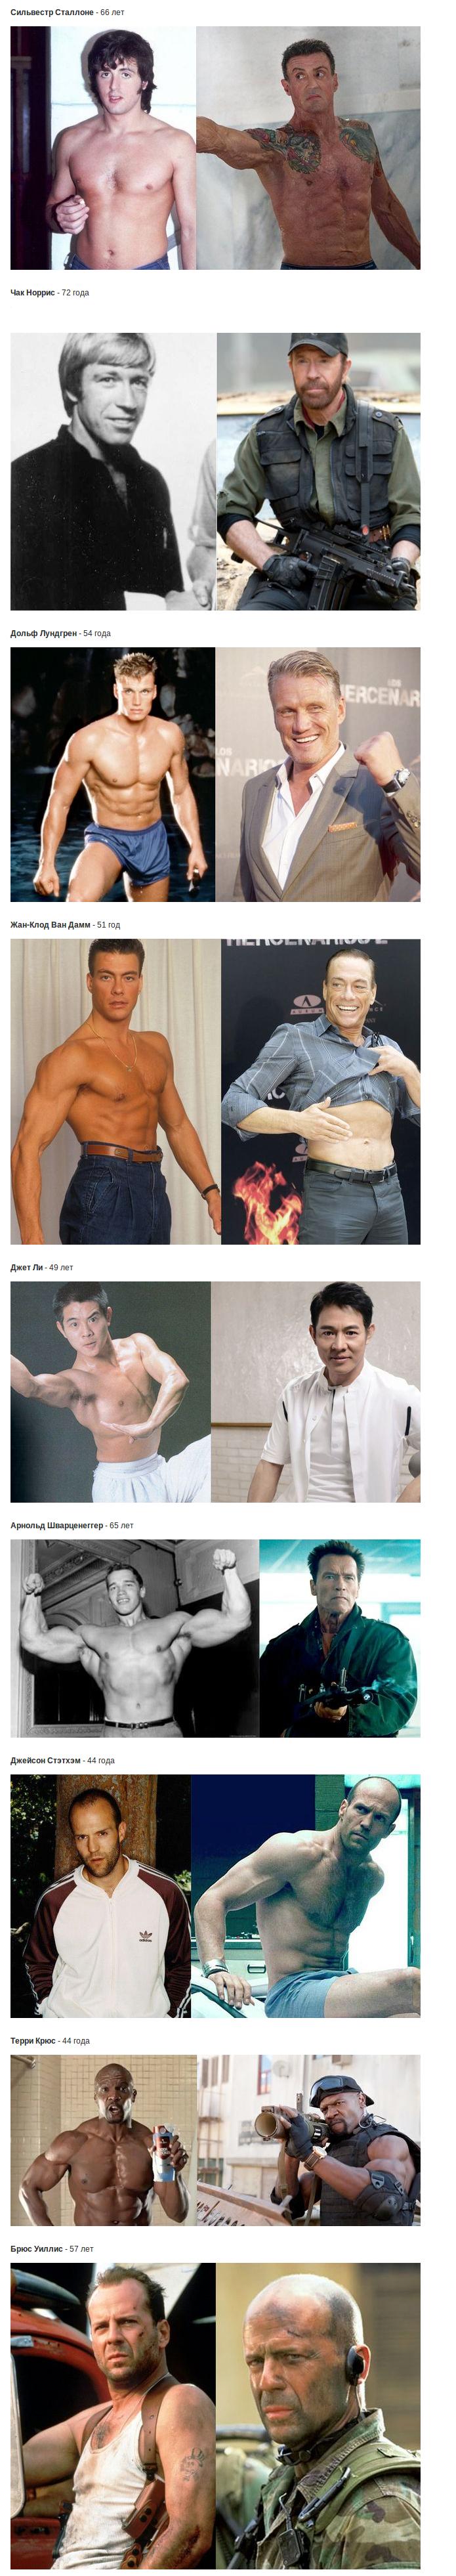 Актеры боевиков 80-90х годов